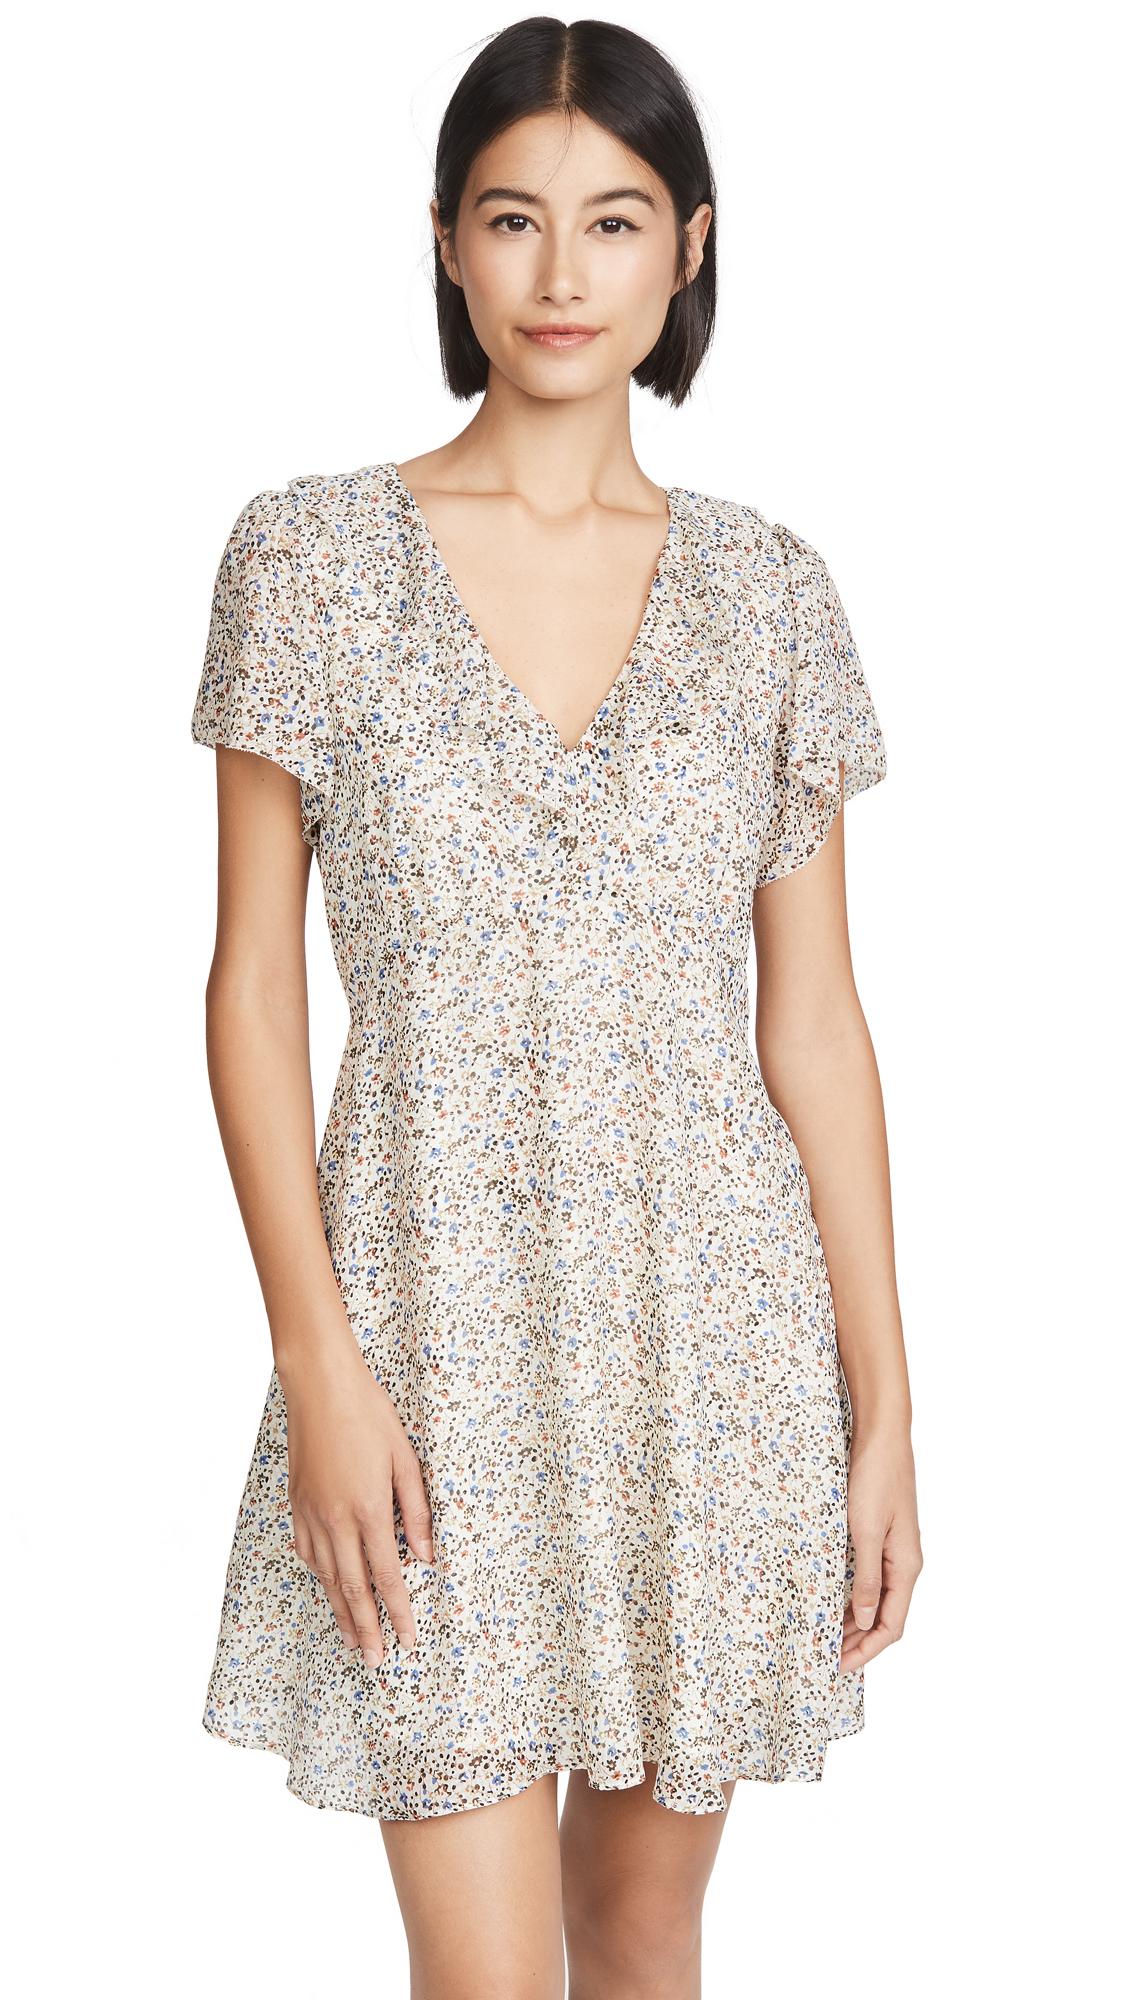 Madewell Ruffle V Neck Mini Dress - 30% Off Sale